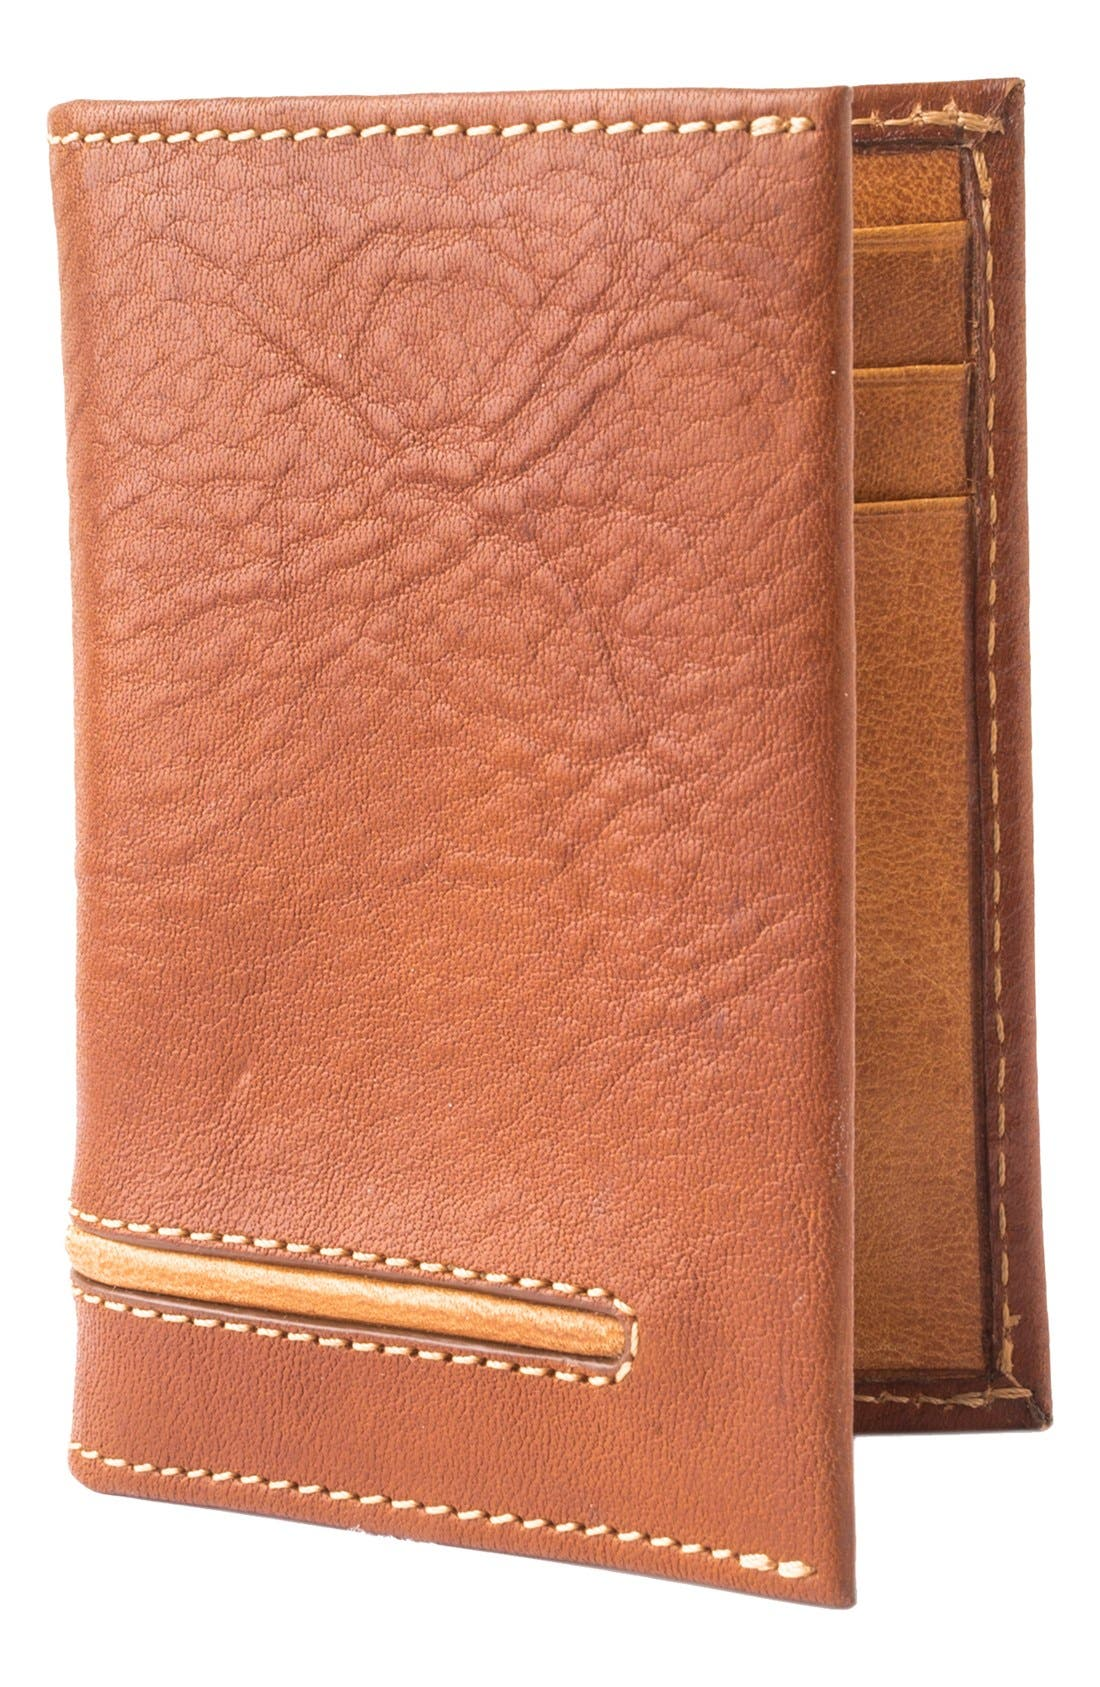 Leather Money Clip Card Case,                             Alternate thumbnail 2, color,                             200